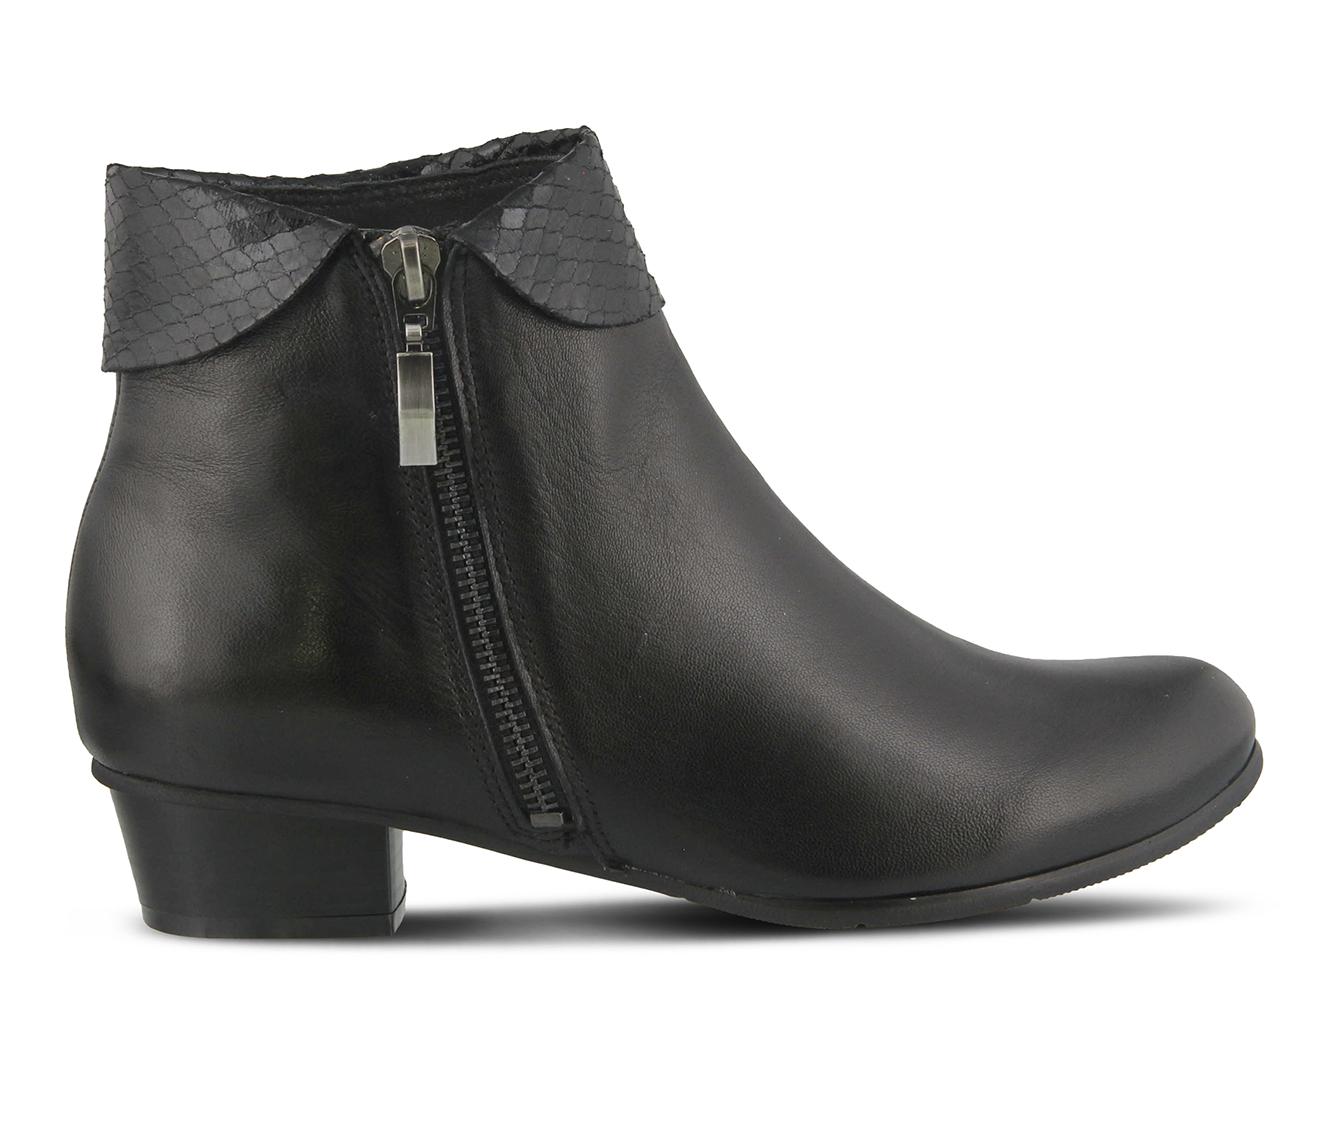 L'Artiste Stockholm Women's Boots (Black Leather)